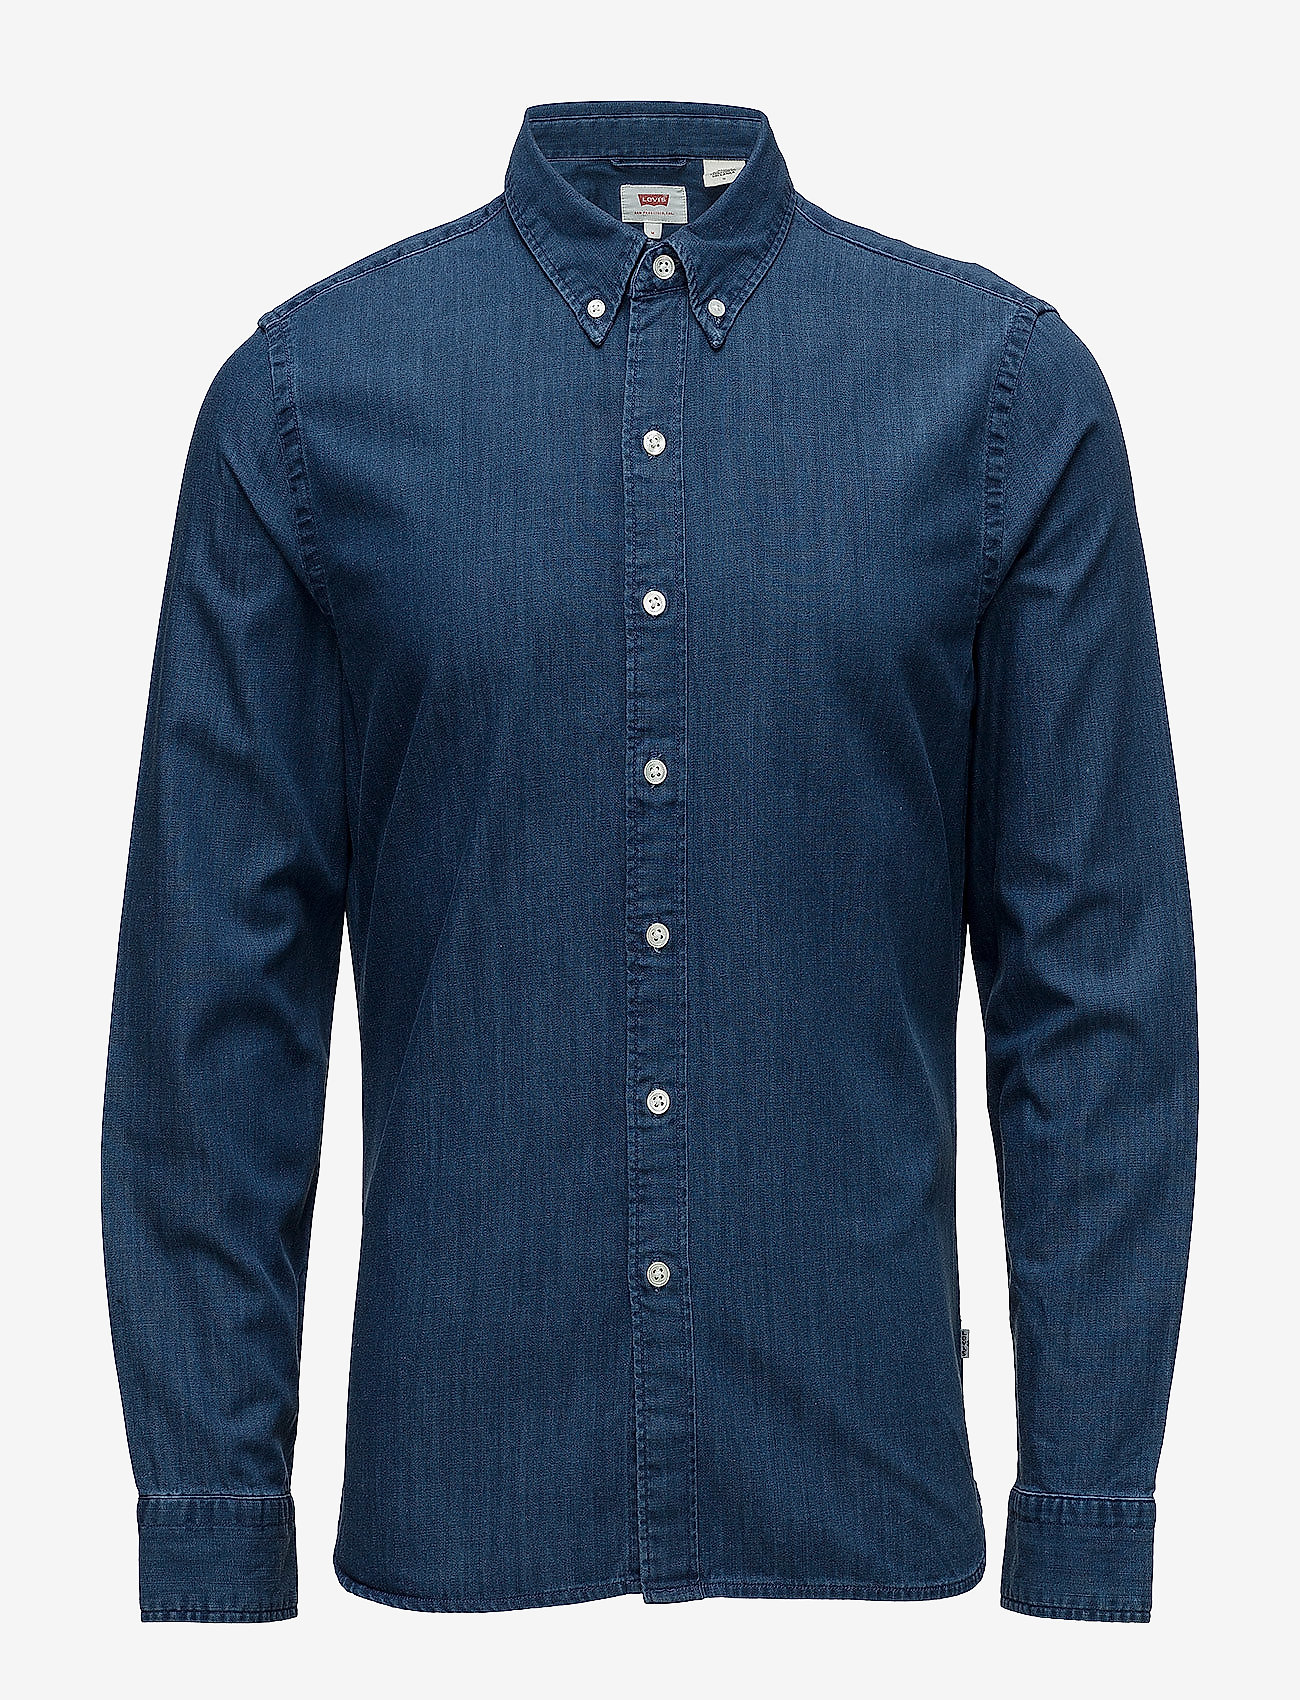 LEVI´S Men - LS PACIFIC NO PKT SHIRT FLAT C - chemises shirts - flat coated indi